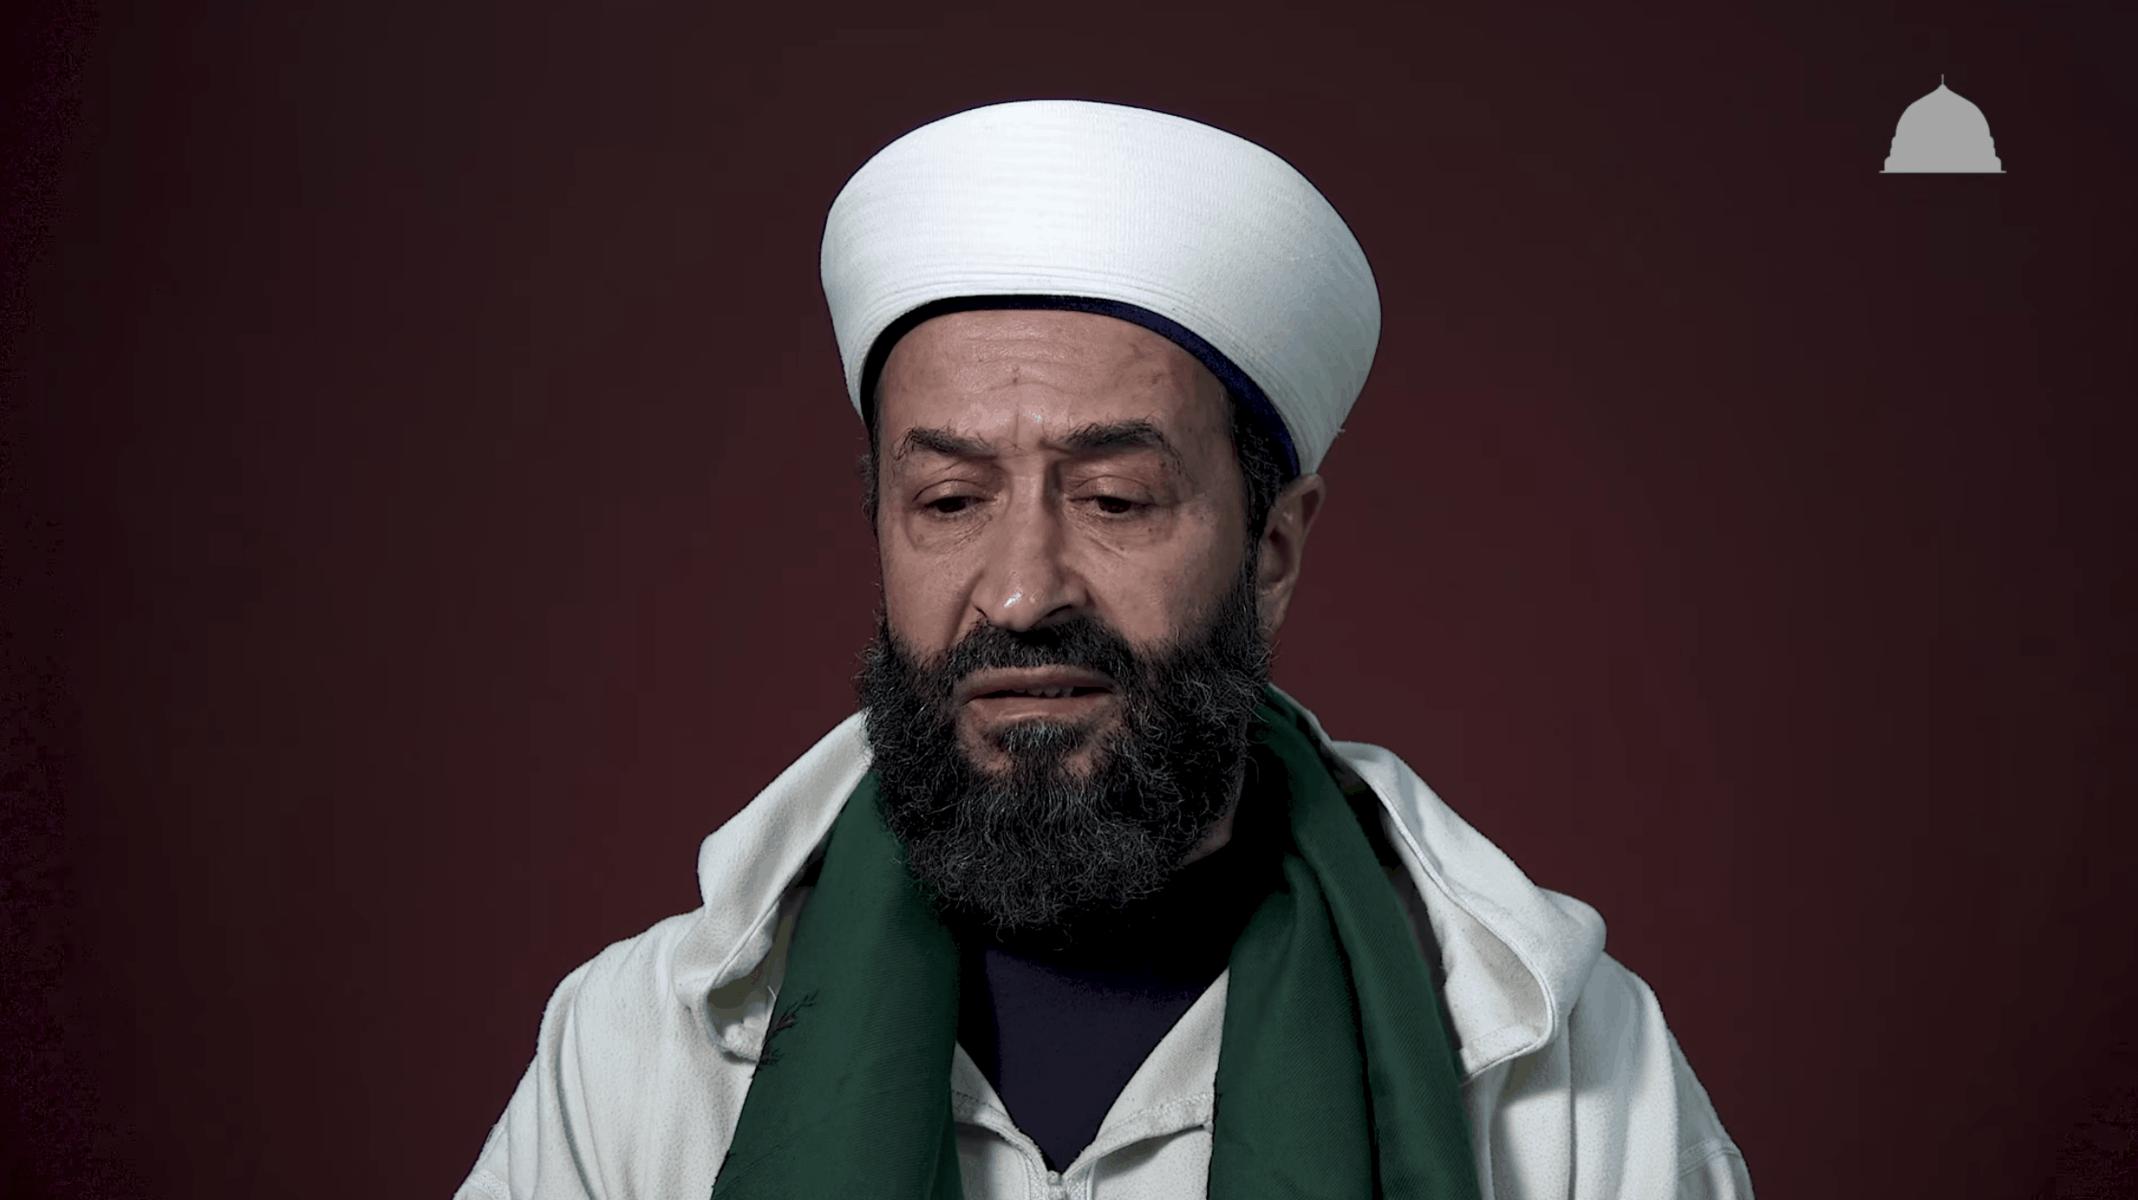 Mokhtar Maghraoui – A Spiritual Response To The Coronavirus